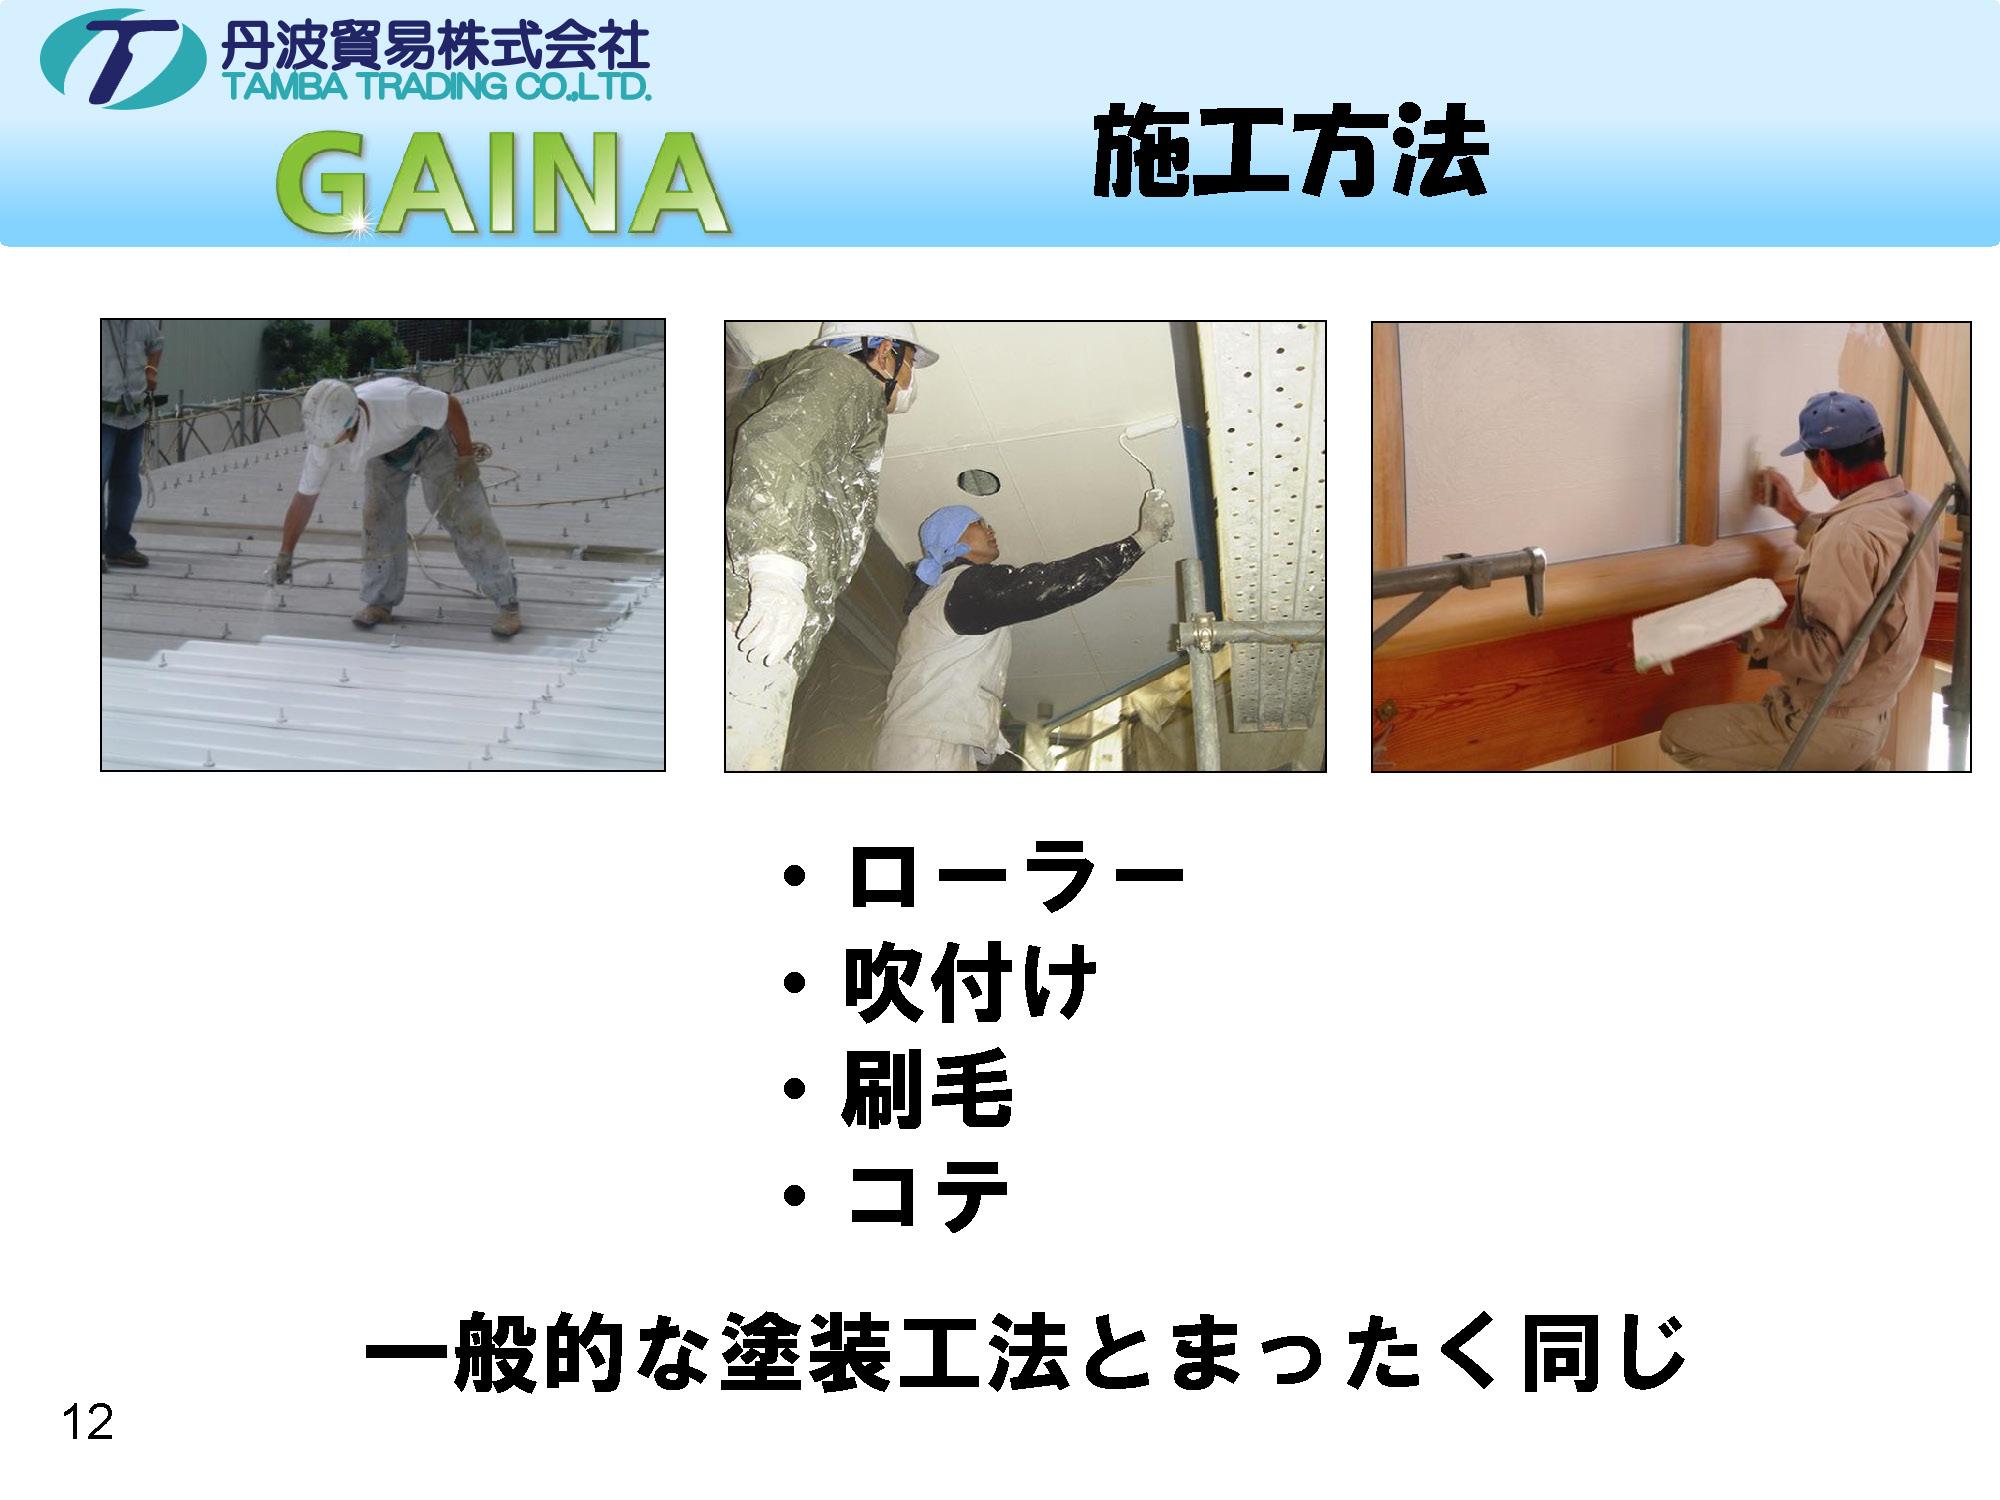 ガイナ紹介_丹波貿易_頁面_12